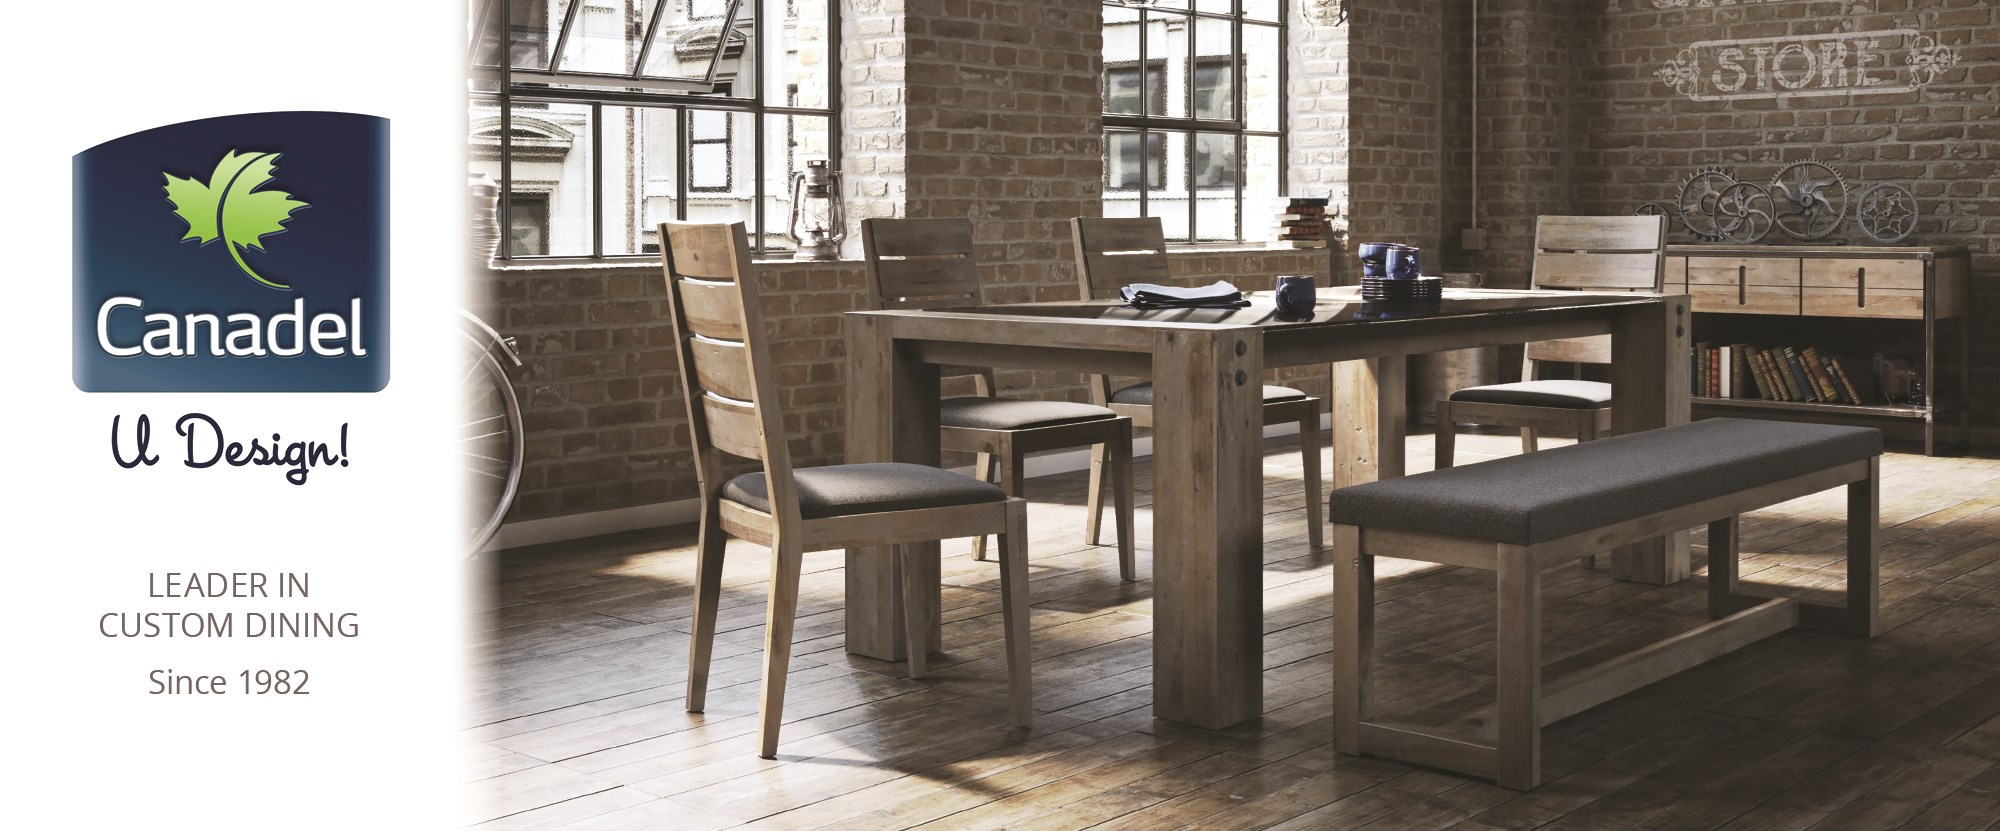 Canadel Custom Dining Furniture At Darvin Furniture